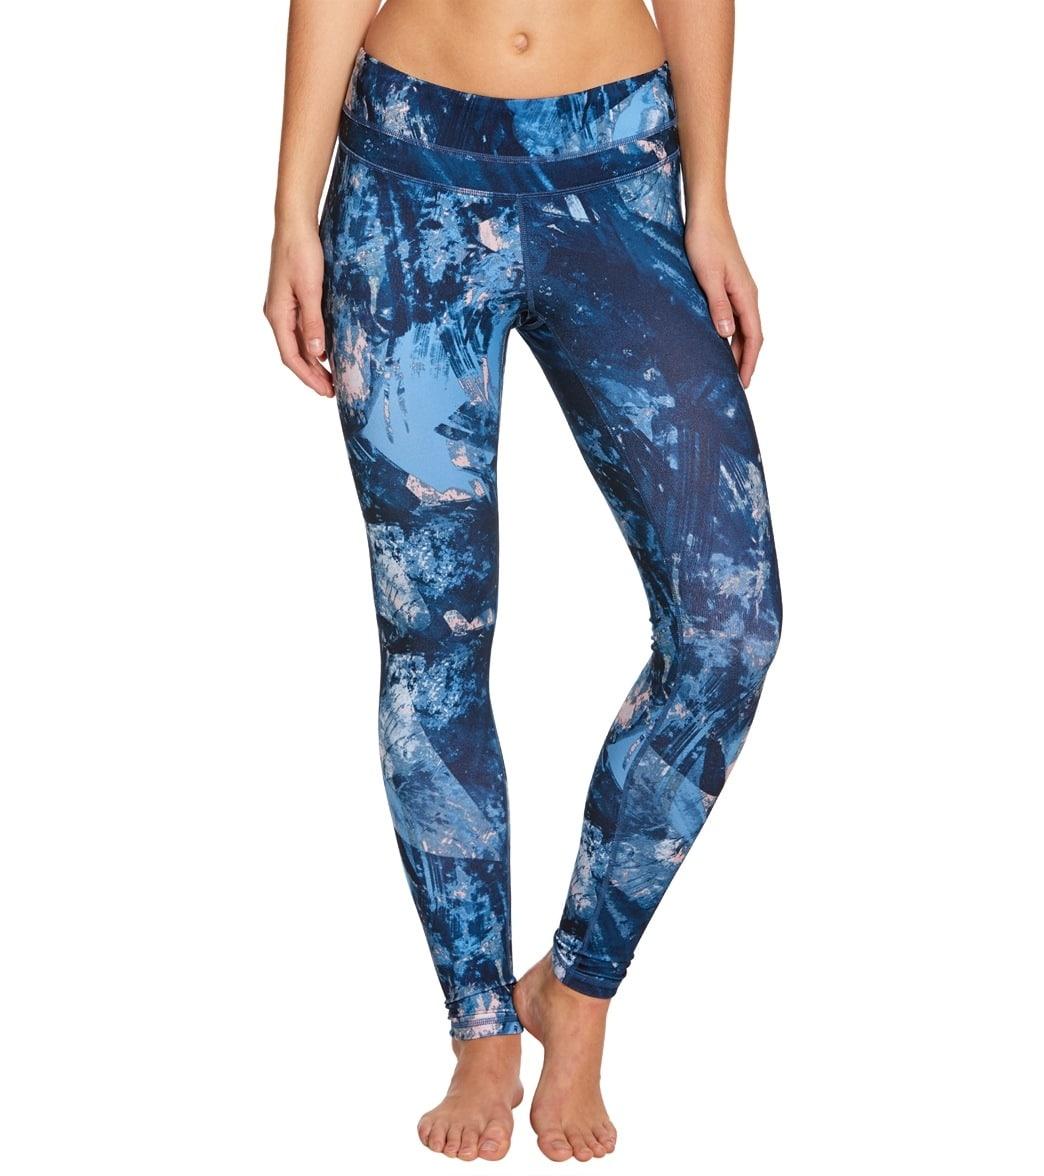 0ae7f461ba2526 Lucy Women's Studio Hatha Legging at SwimOutlet.com - Free Shipping